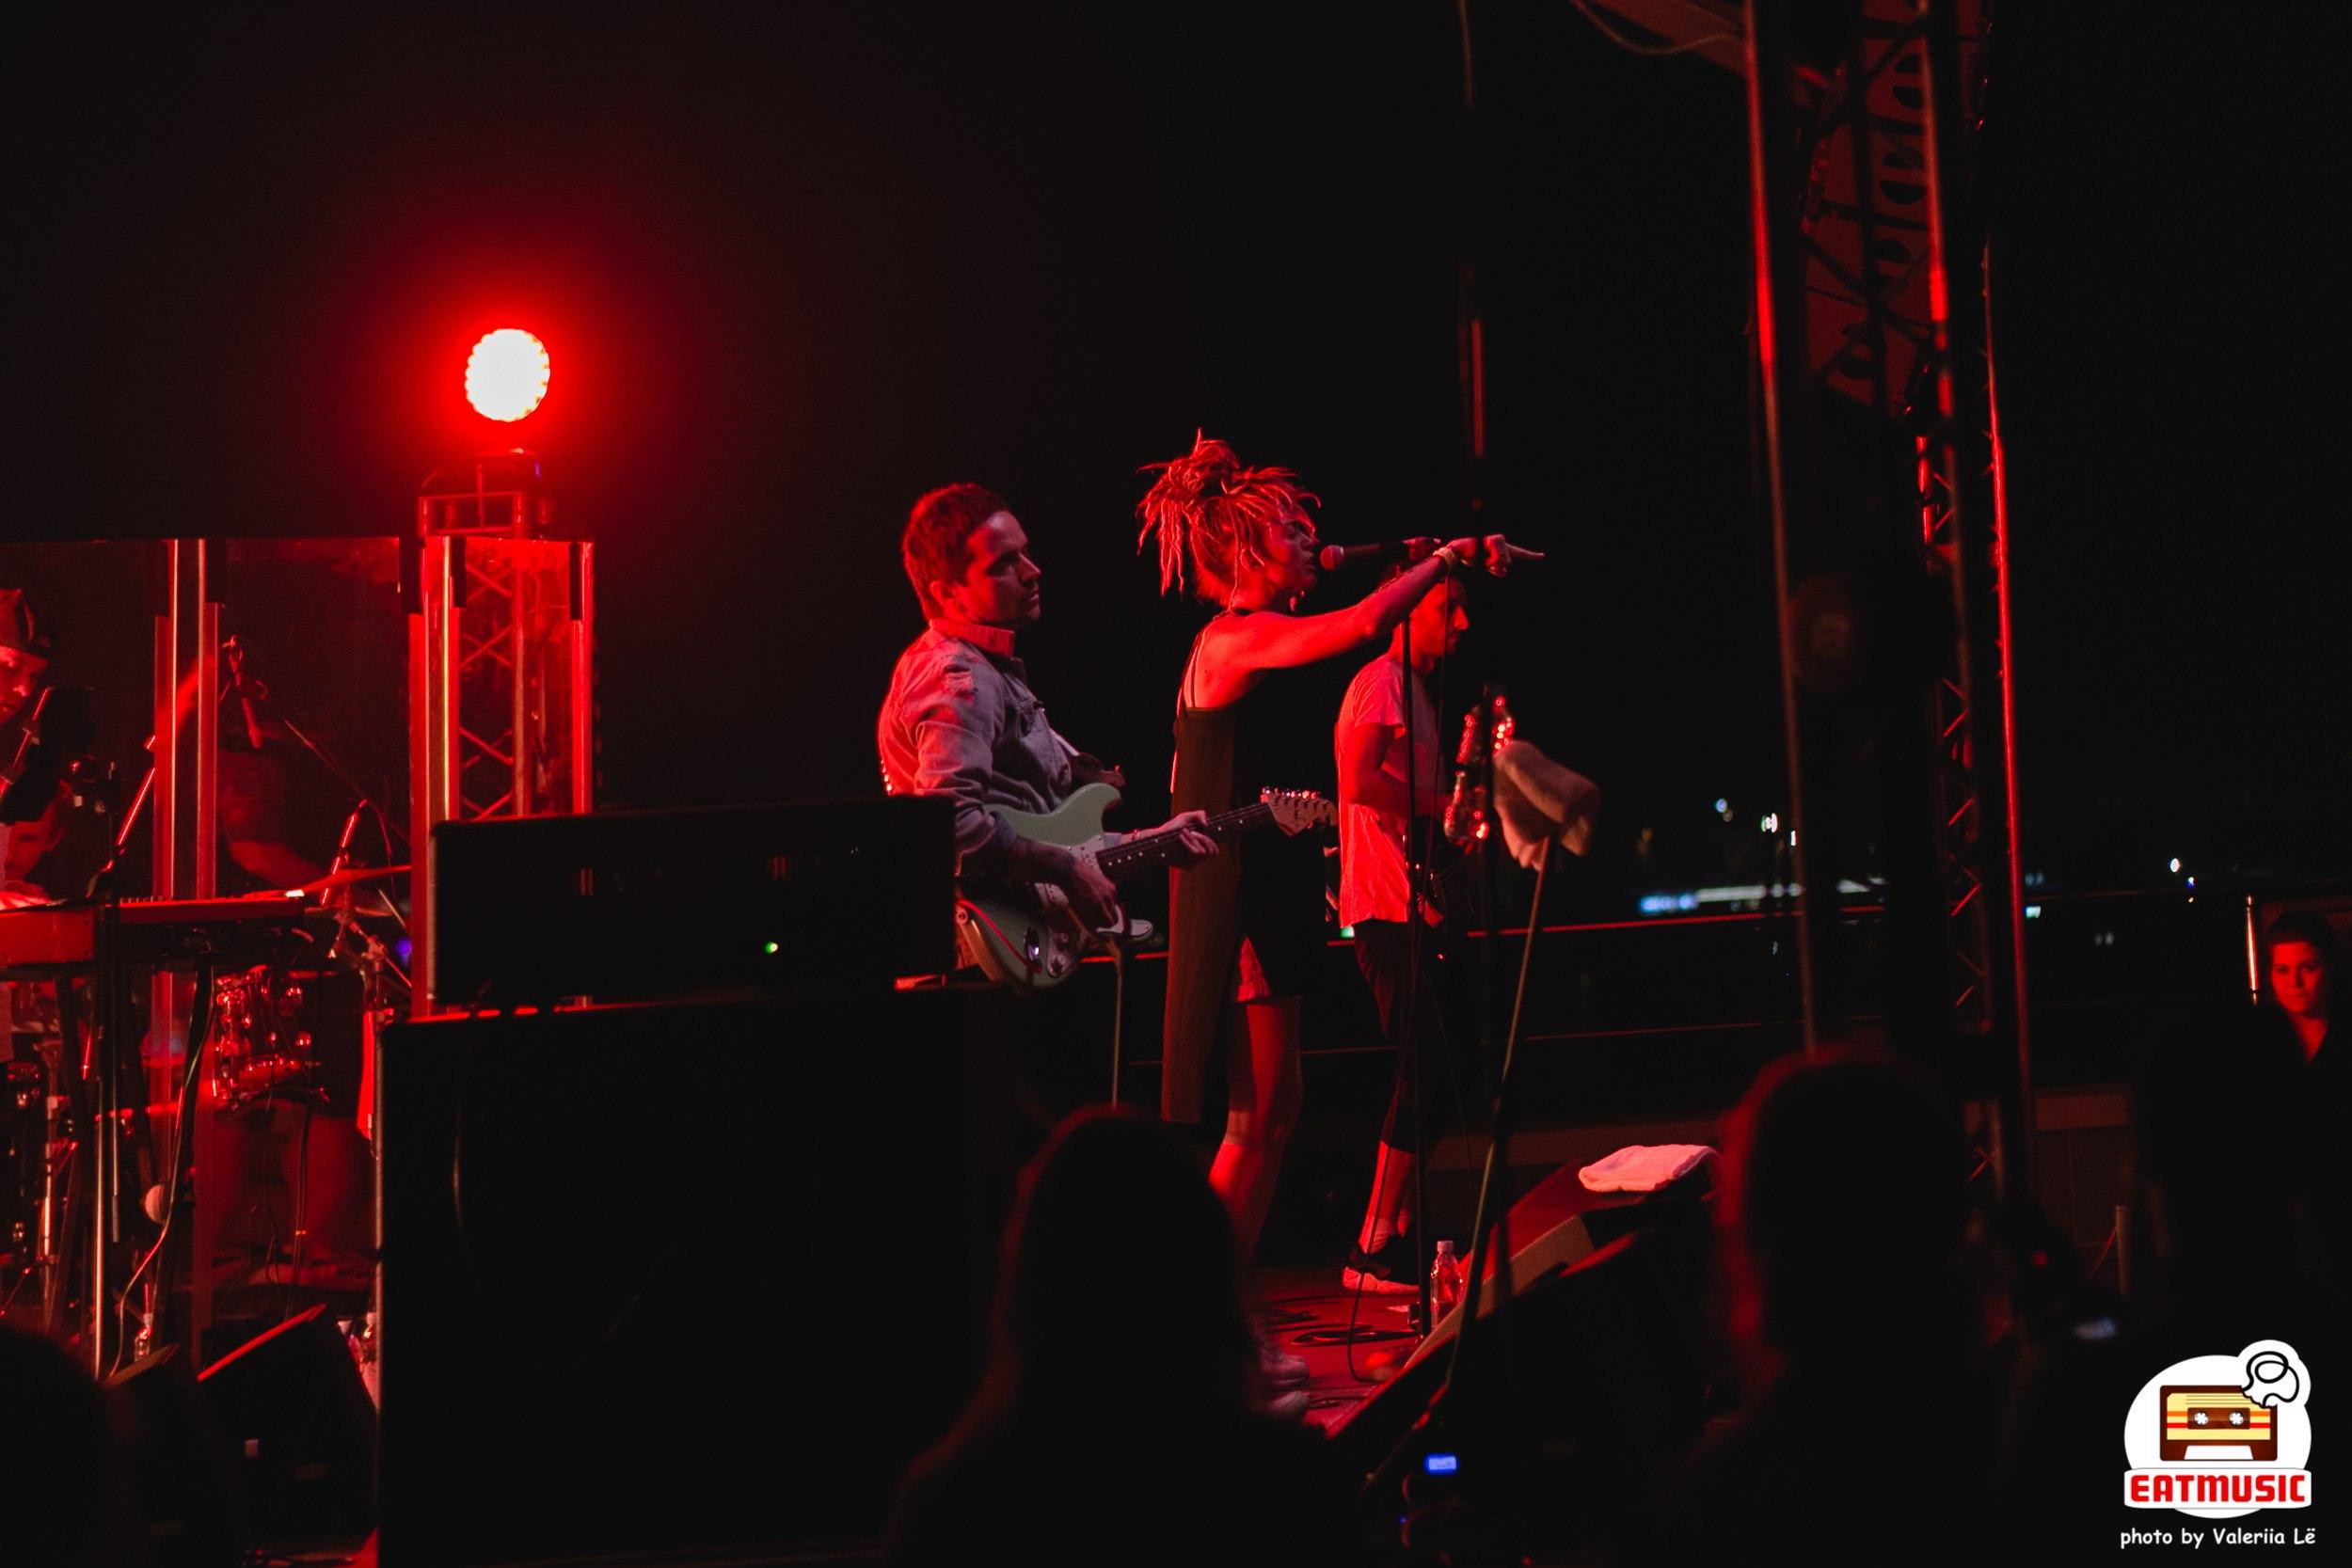 Концерт Alai Oli на крыше InCloud в Москве 13-08-2017: репортаж, фото Валерия Литвак